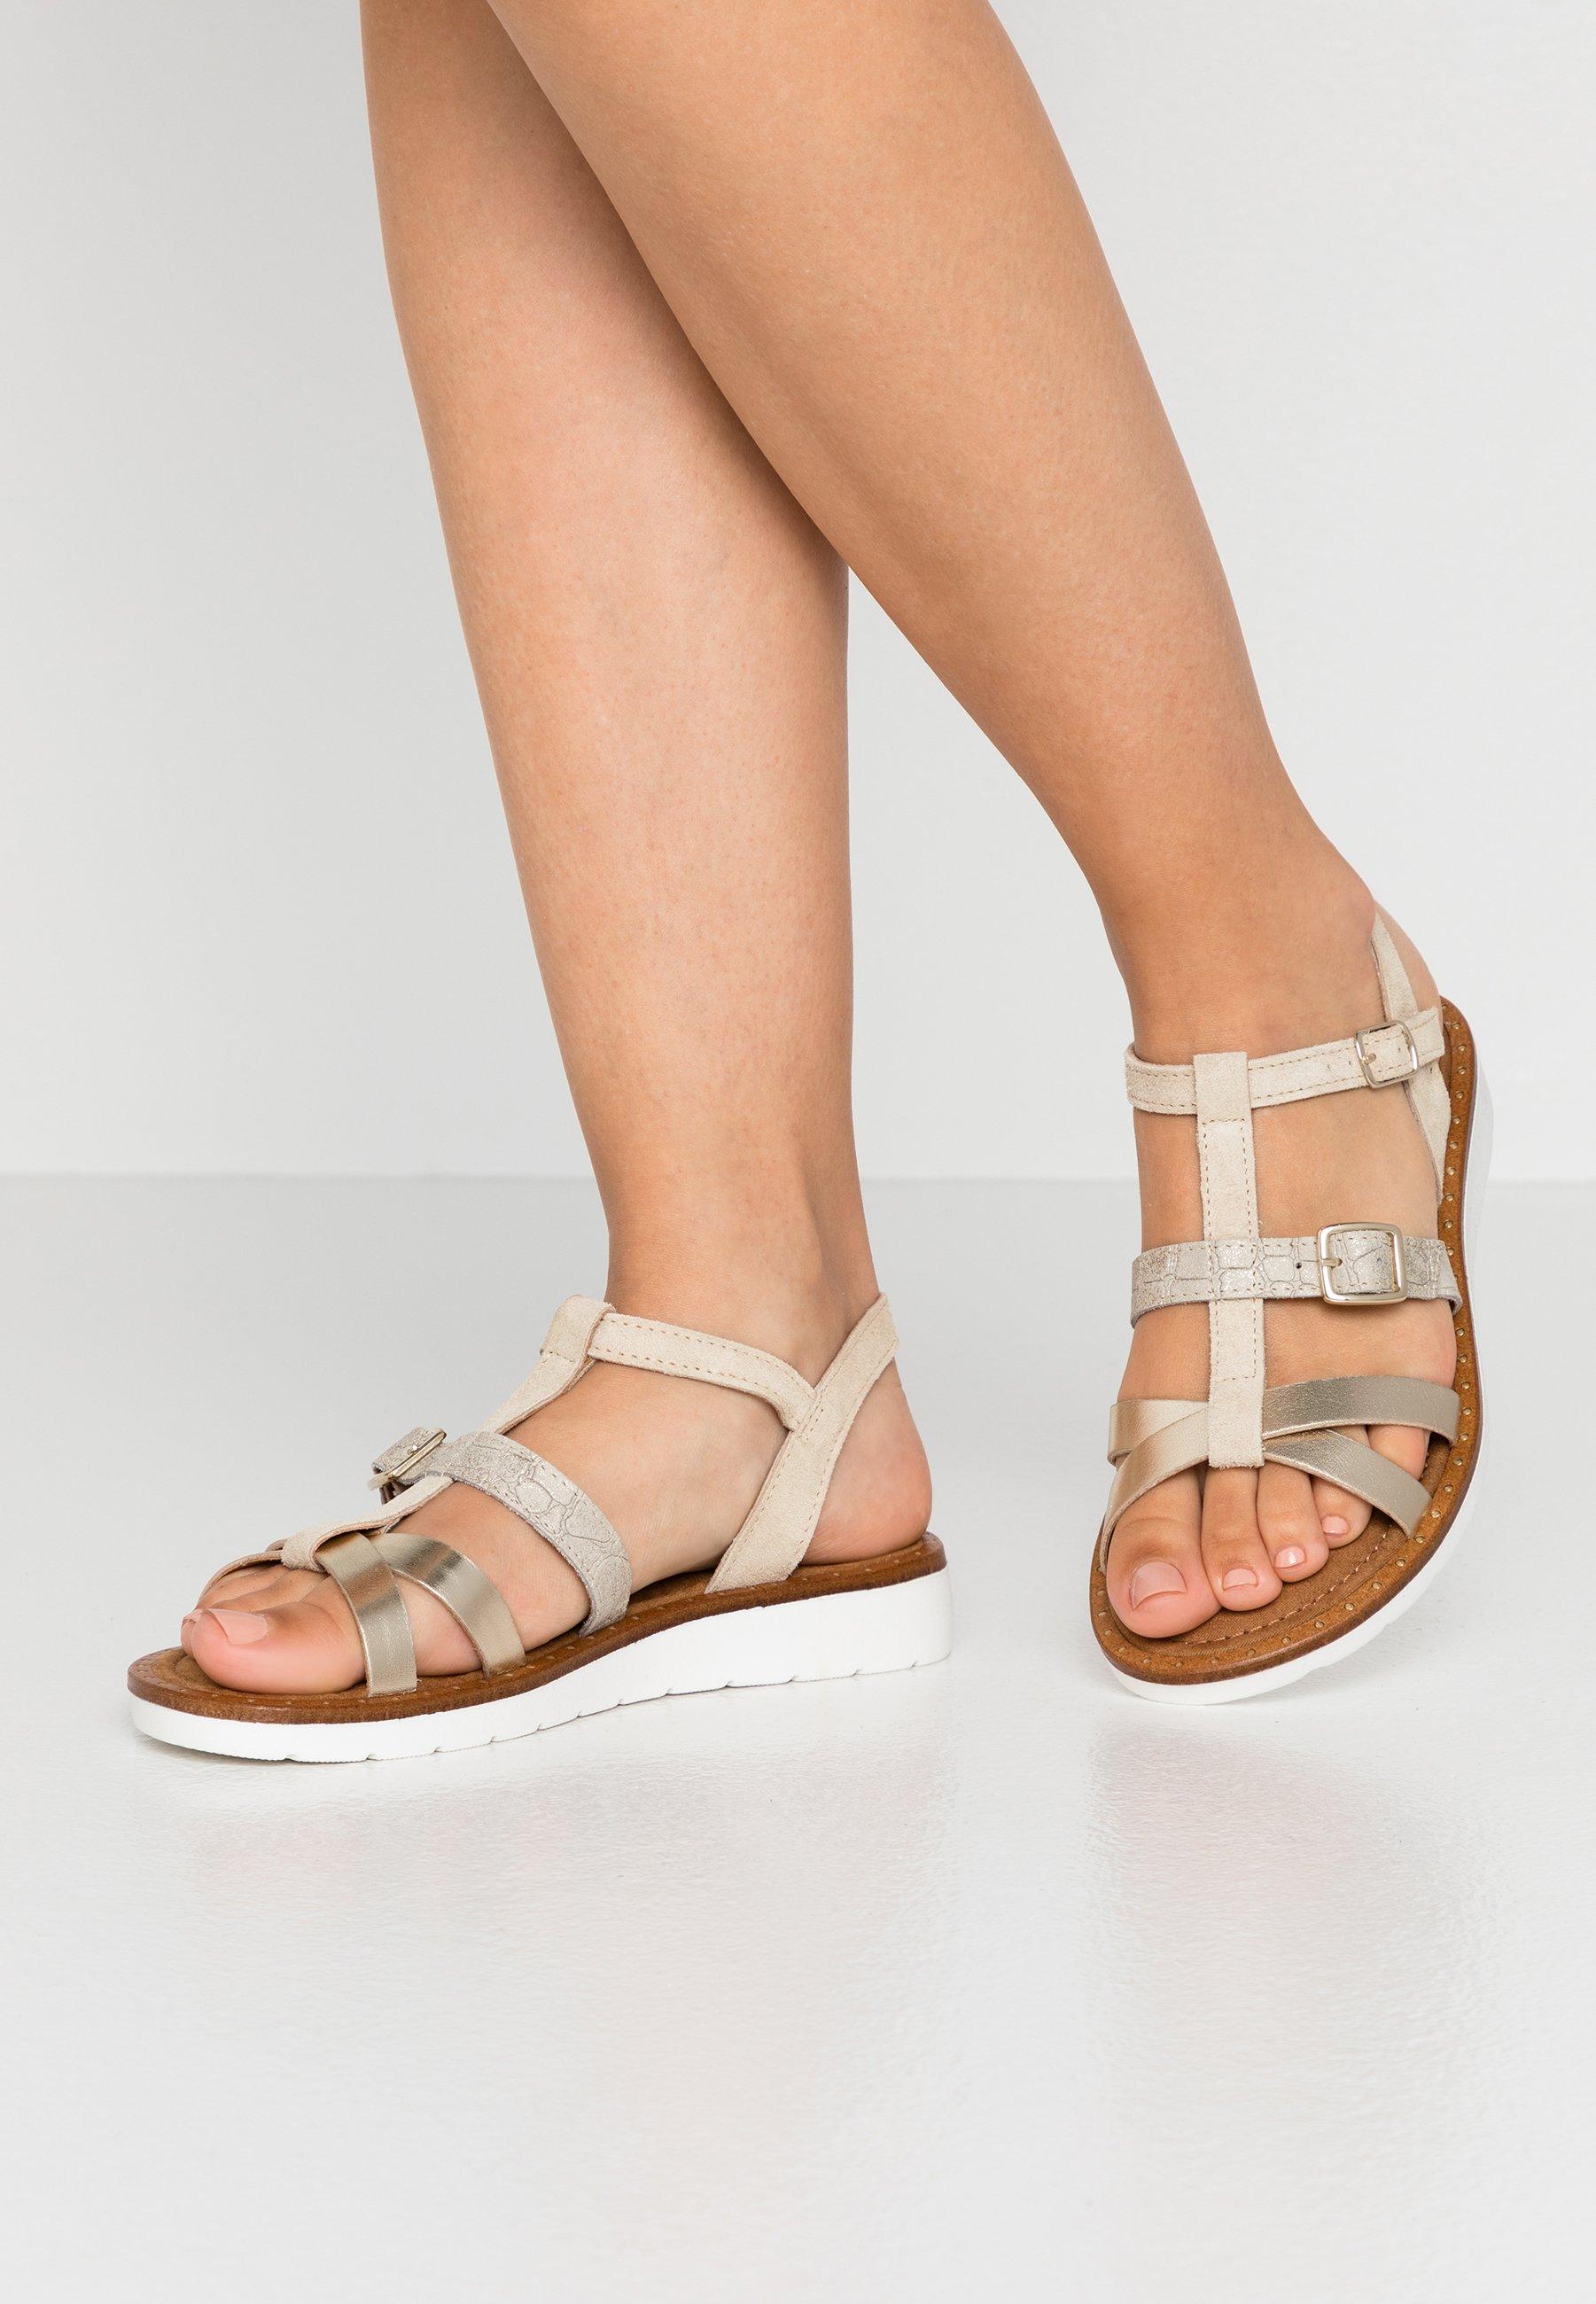 Sandale Vert Grand Plate Et Fille Nu Hee À Femme Attach